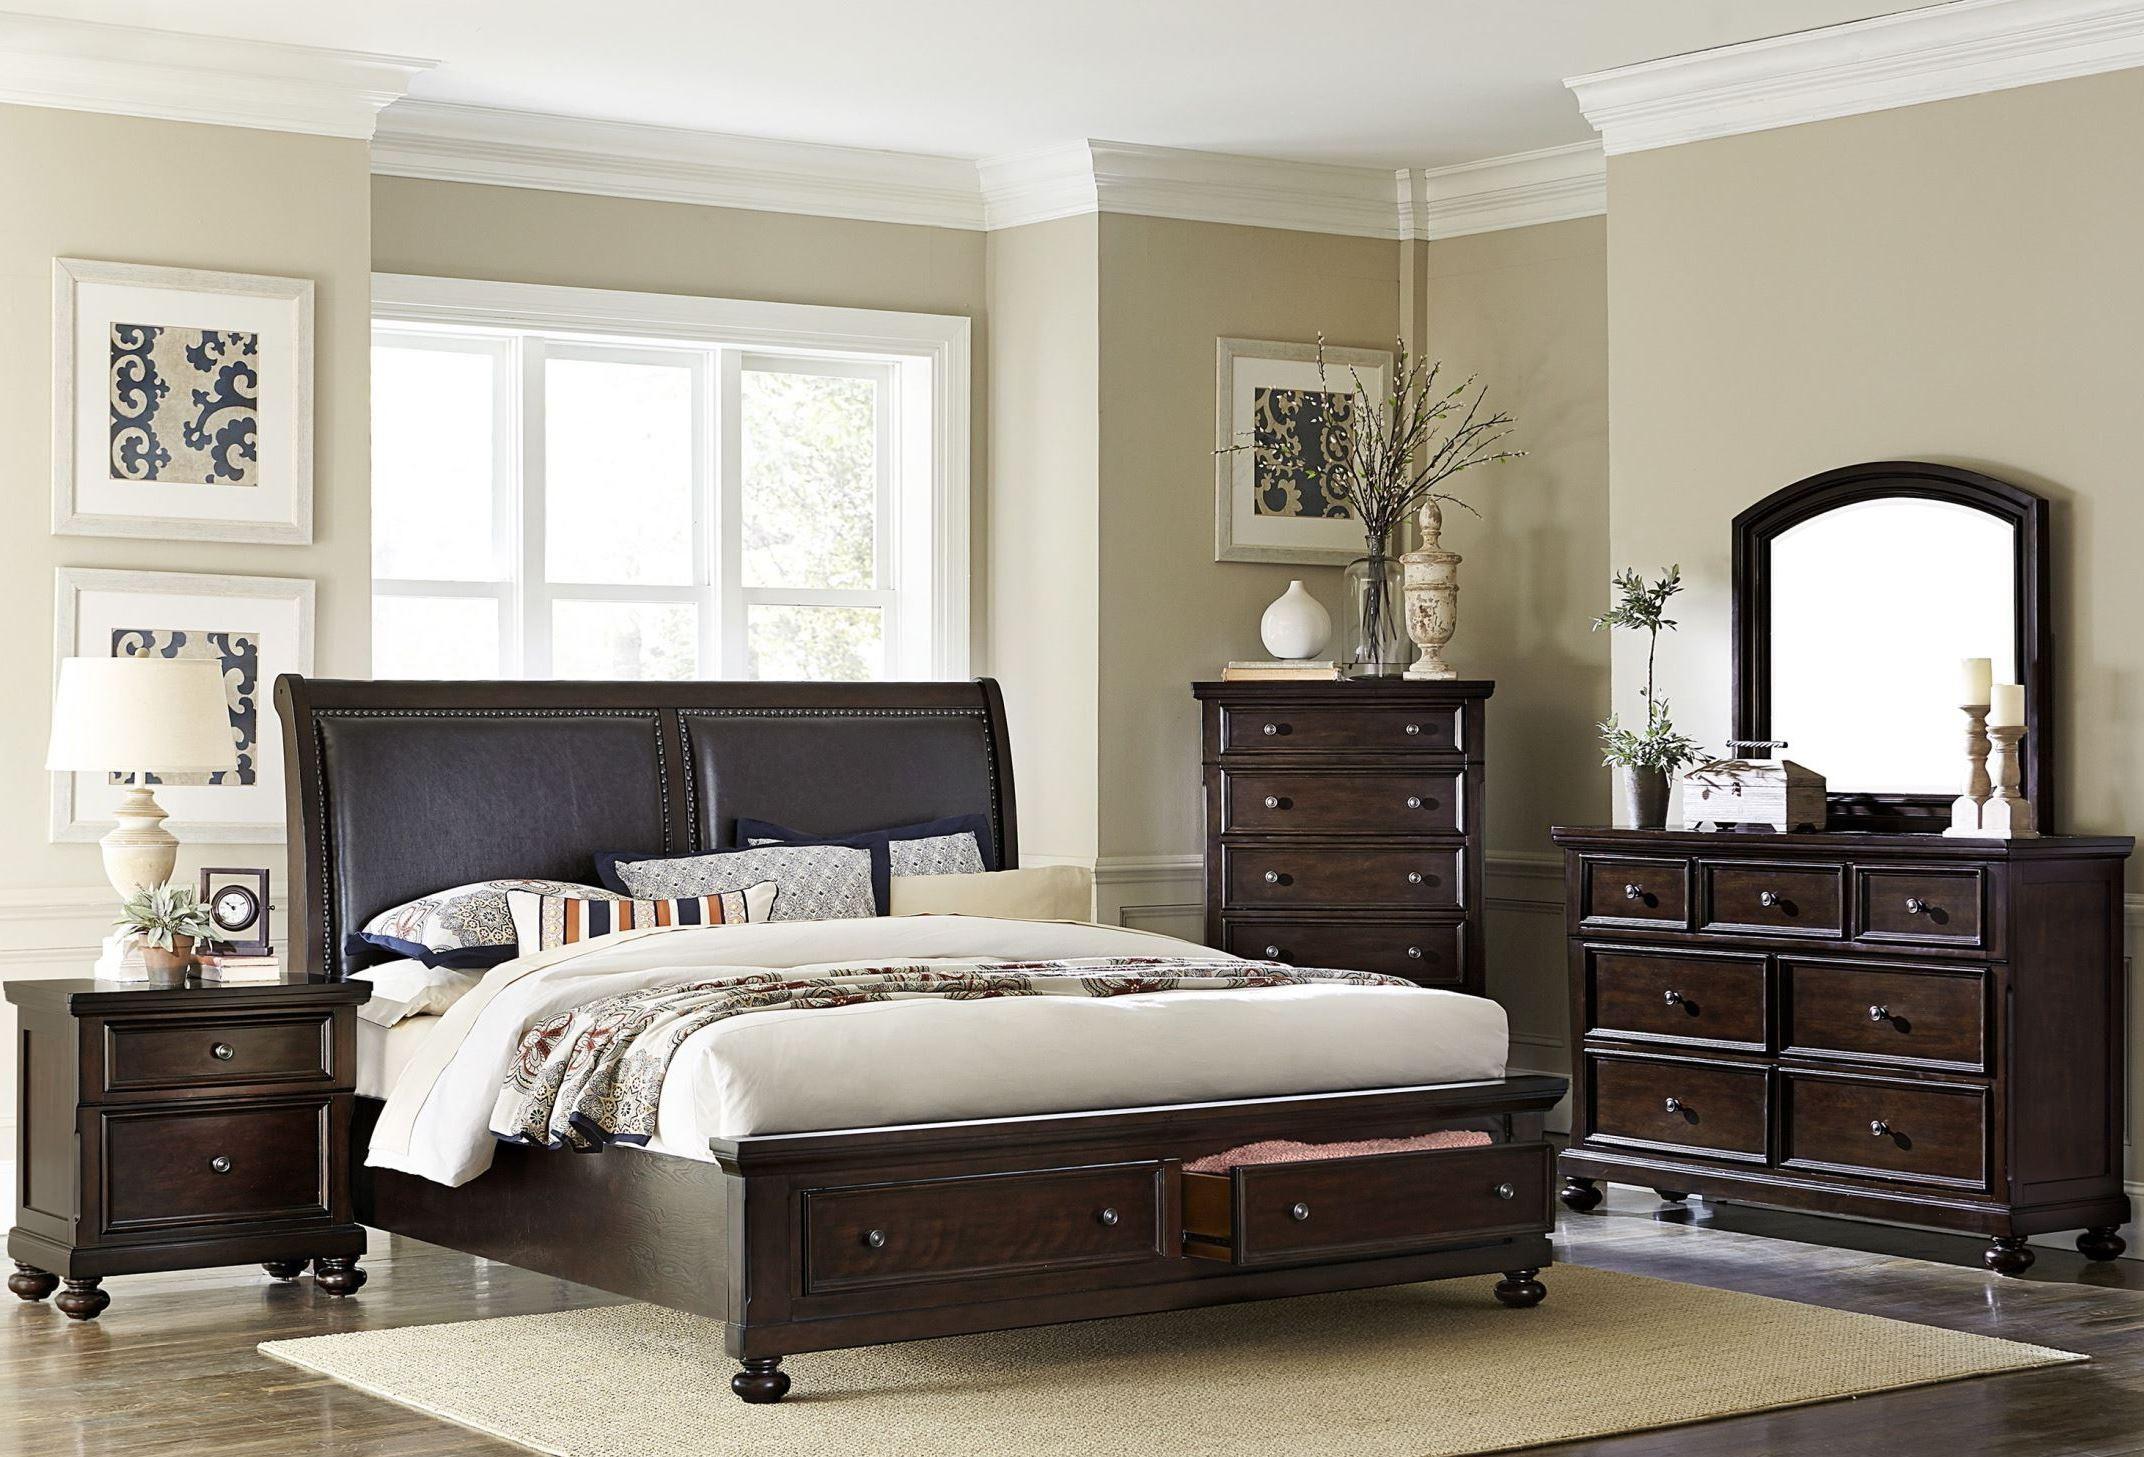 Faust Dark Cherry Storage Platform Bedroom Set From